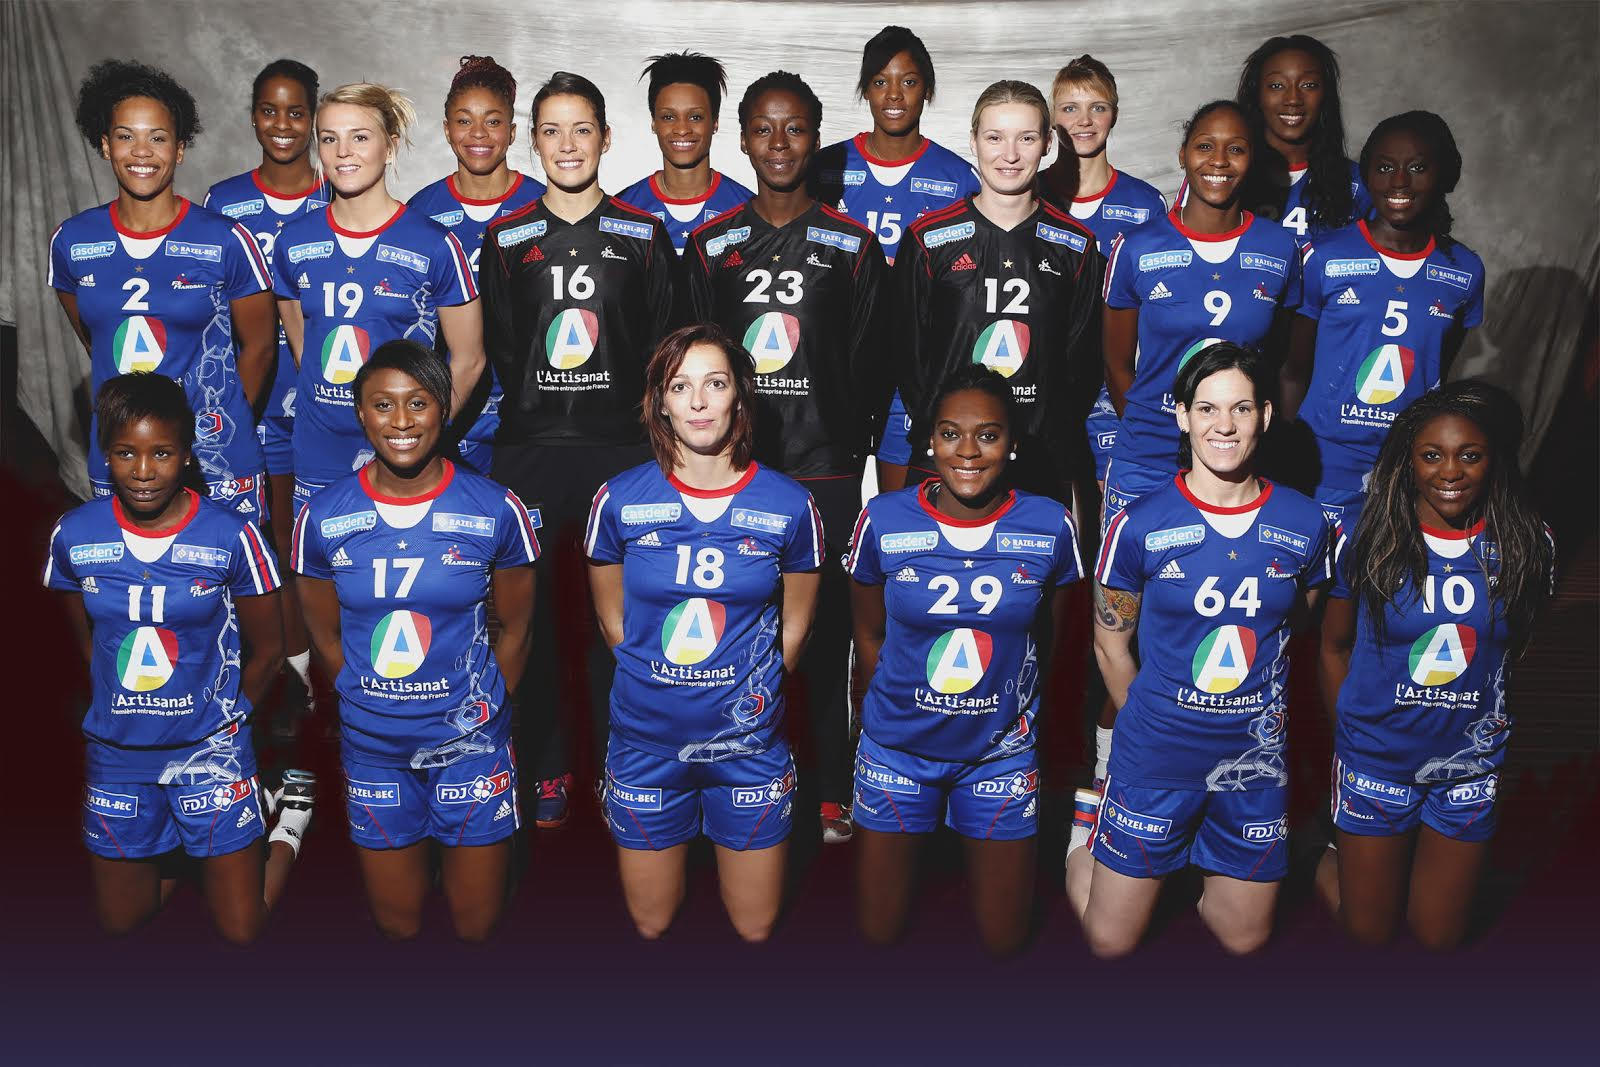 bleues dans Championnat du monde féminin [Handball]